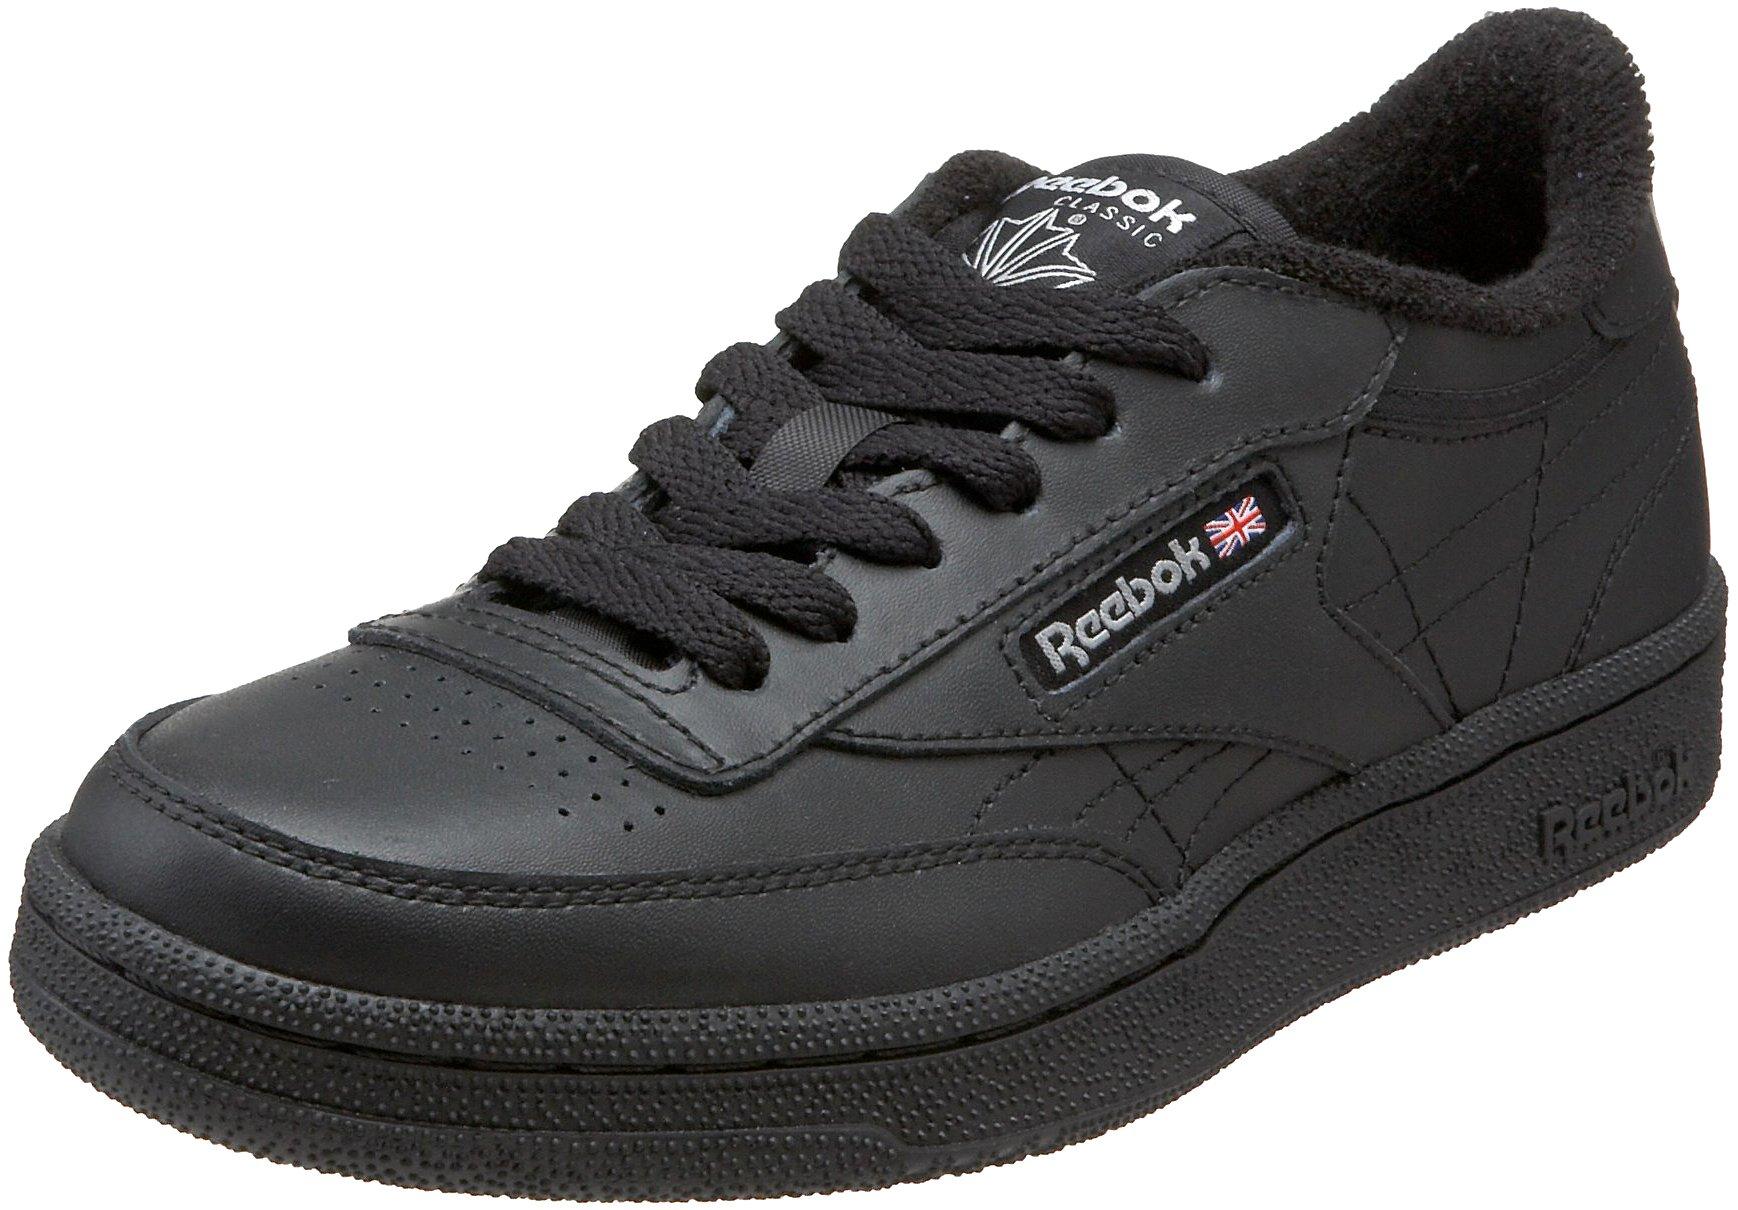 Reebok Kids' Club Fashion Sneaker,Black/Charcoal,5.5 M US Big Kid